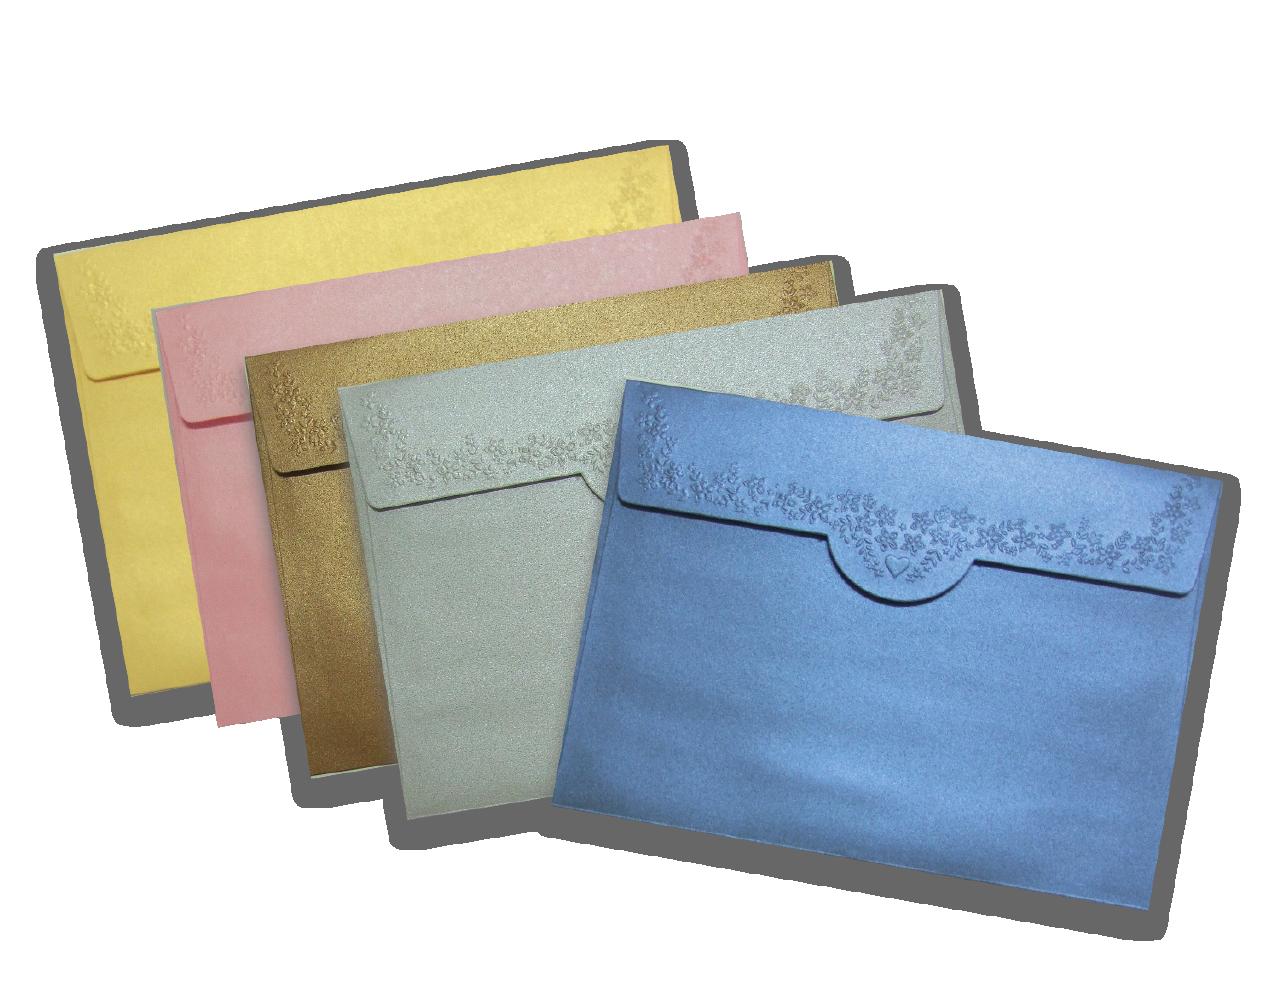 Envelope 16.5 x 22.5 cm. 100 g ฿ 4.00